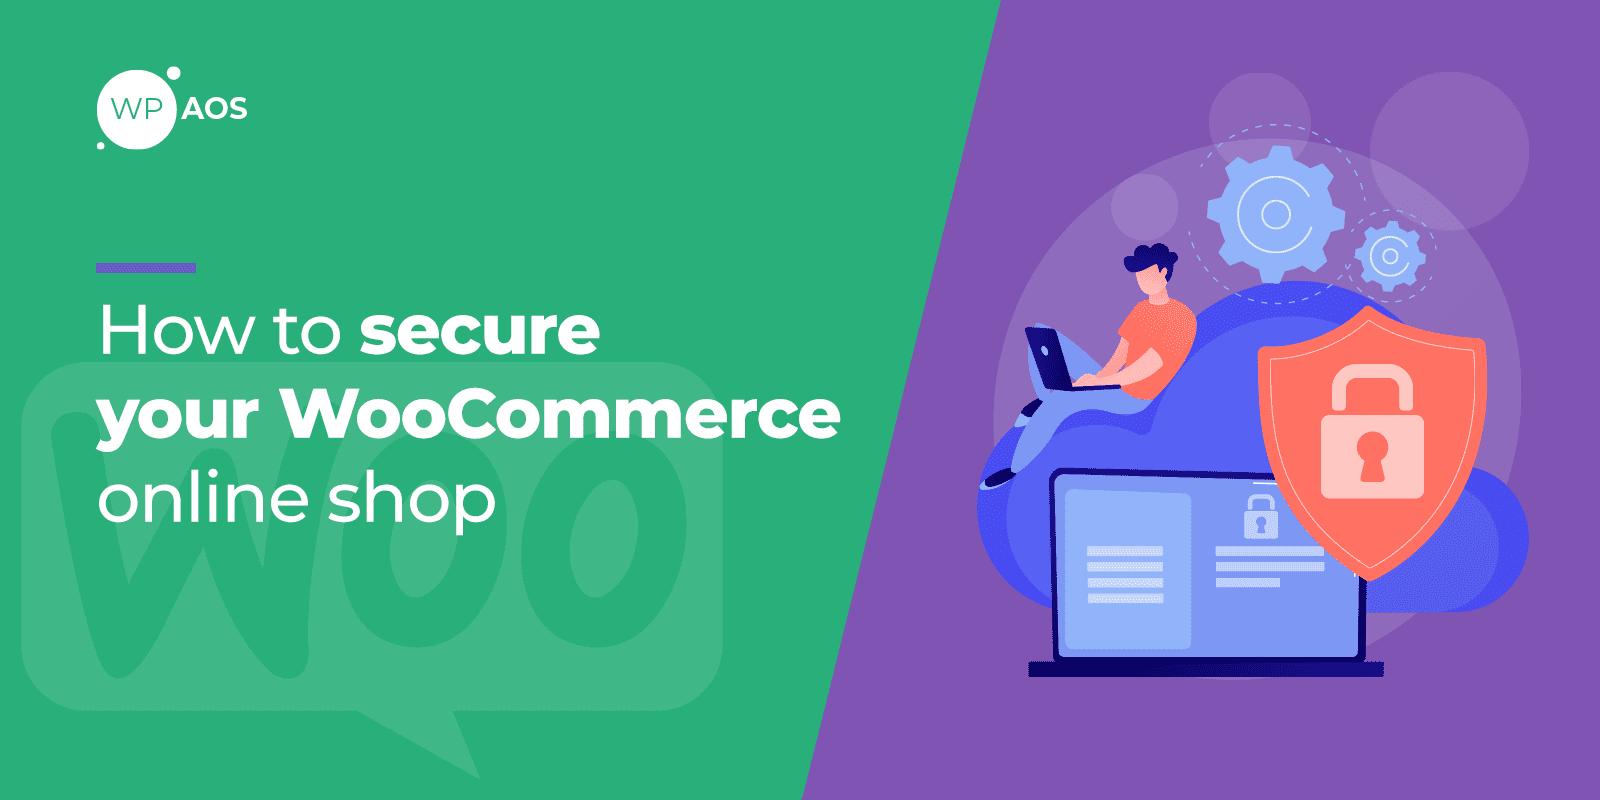 Secure WooCommerce, WordPress maintenance, wpaos